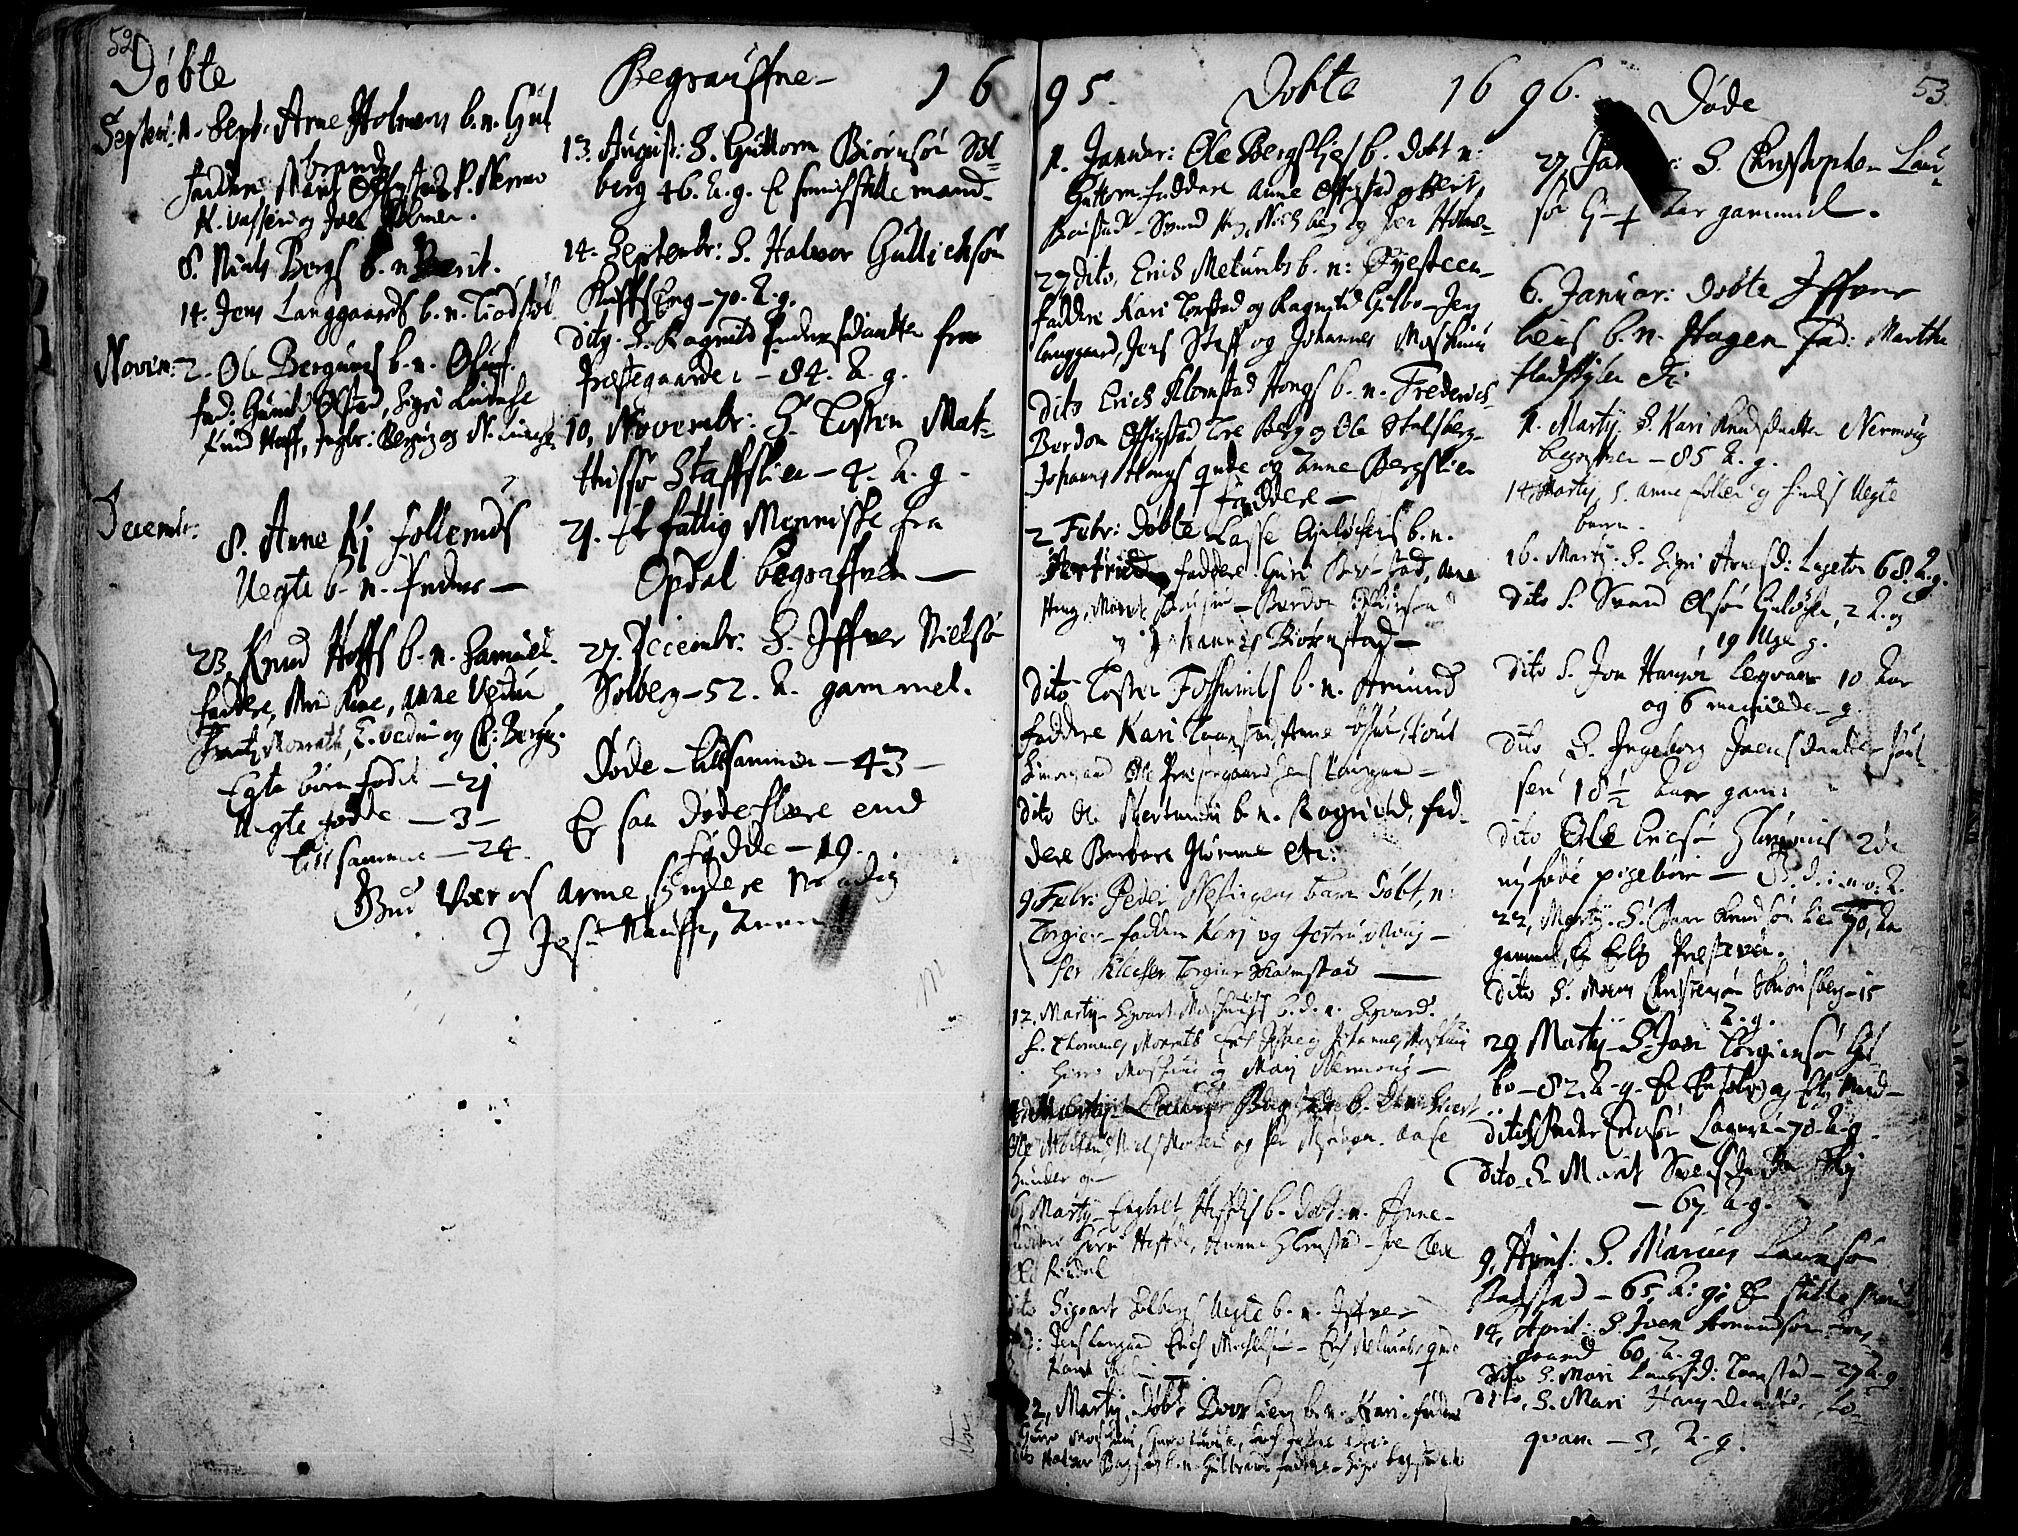 SAH, Øyer prestekontor, Ministerialbok nr. 1, 1671-1727, s. 52-53